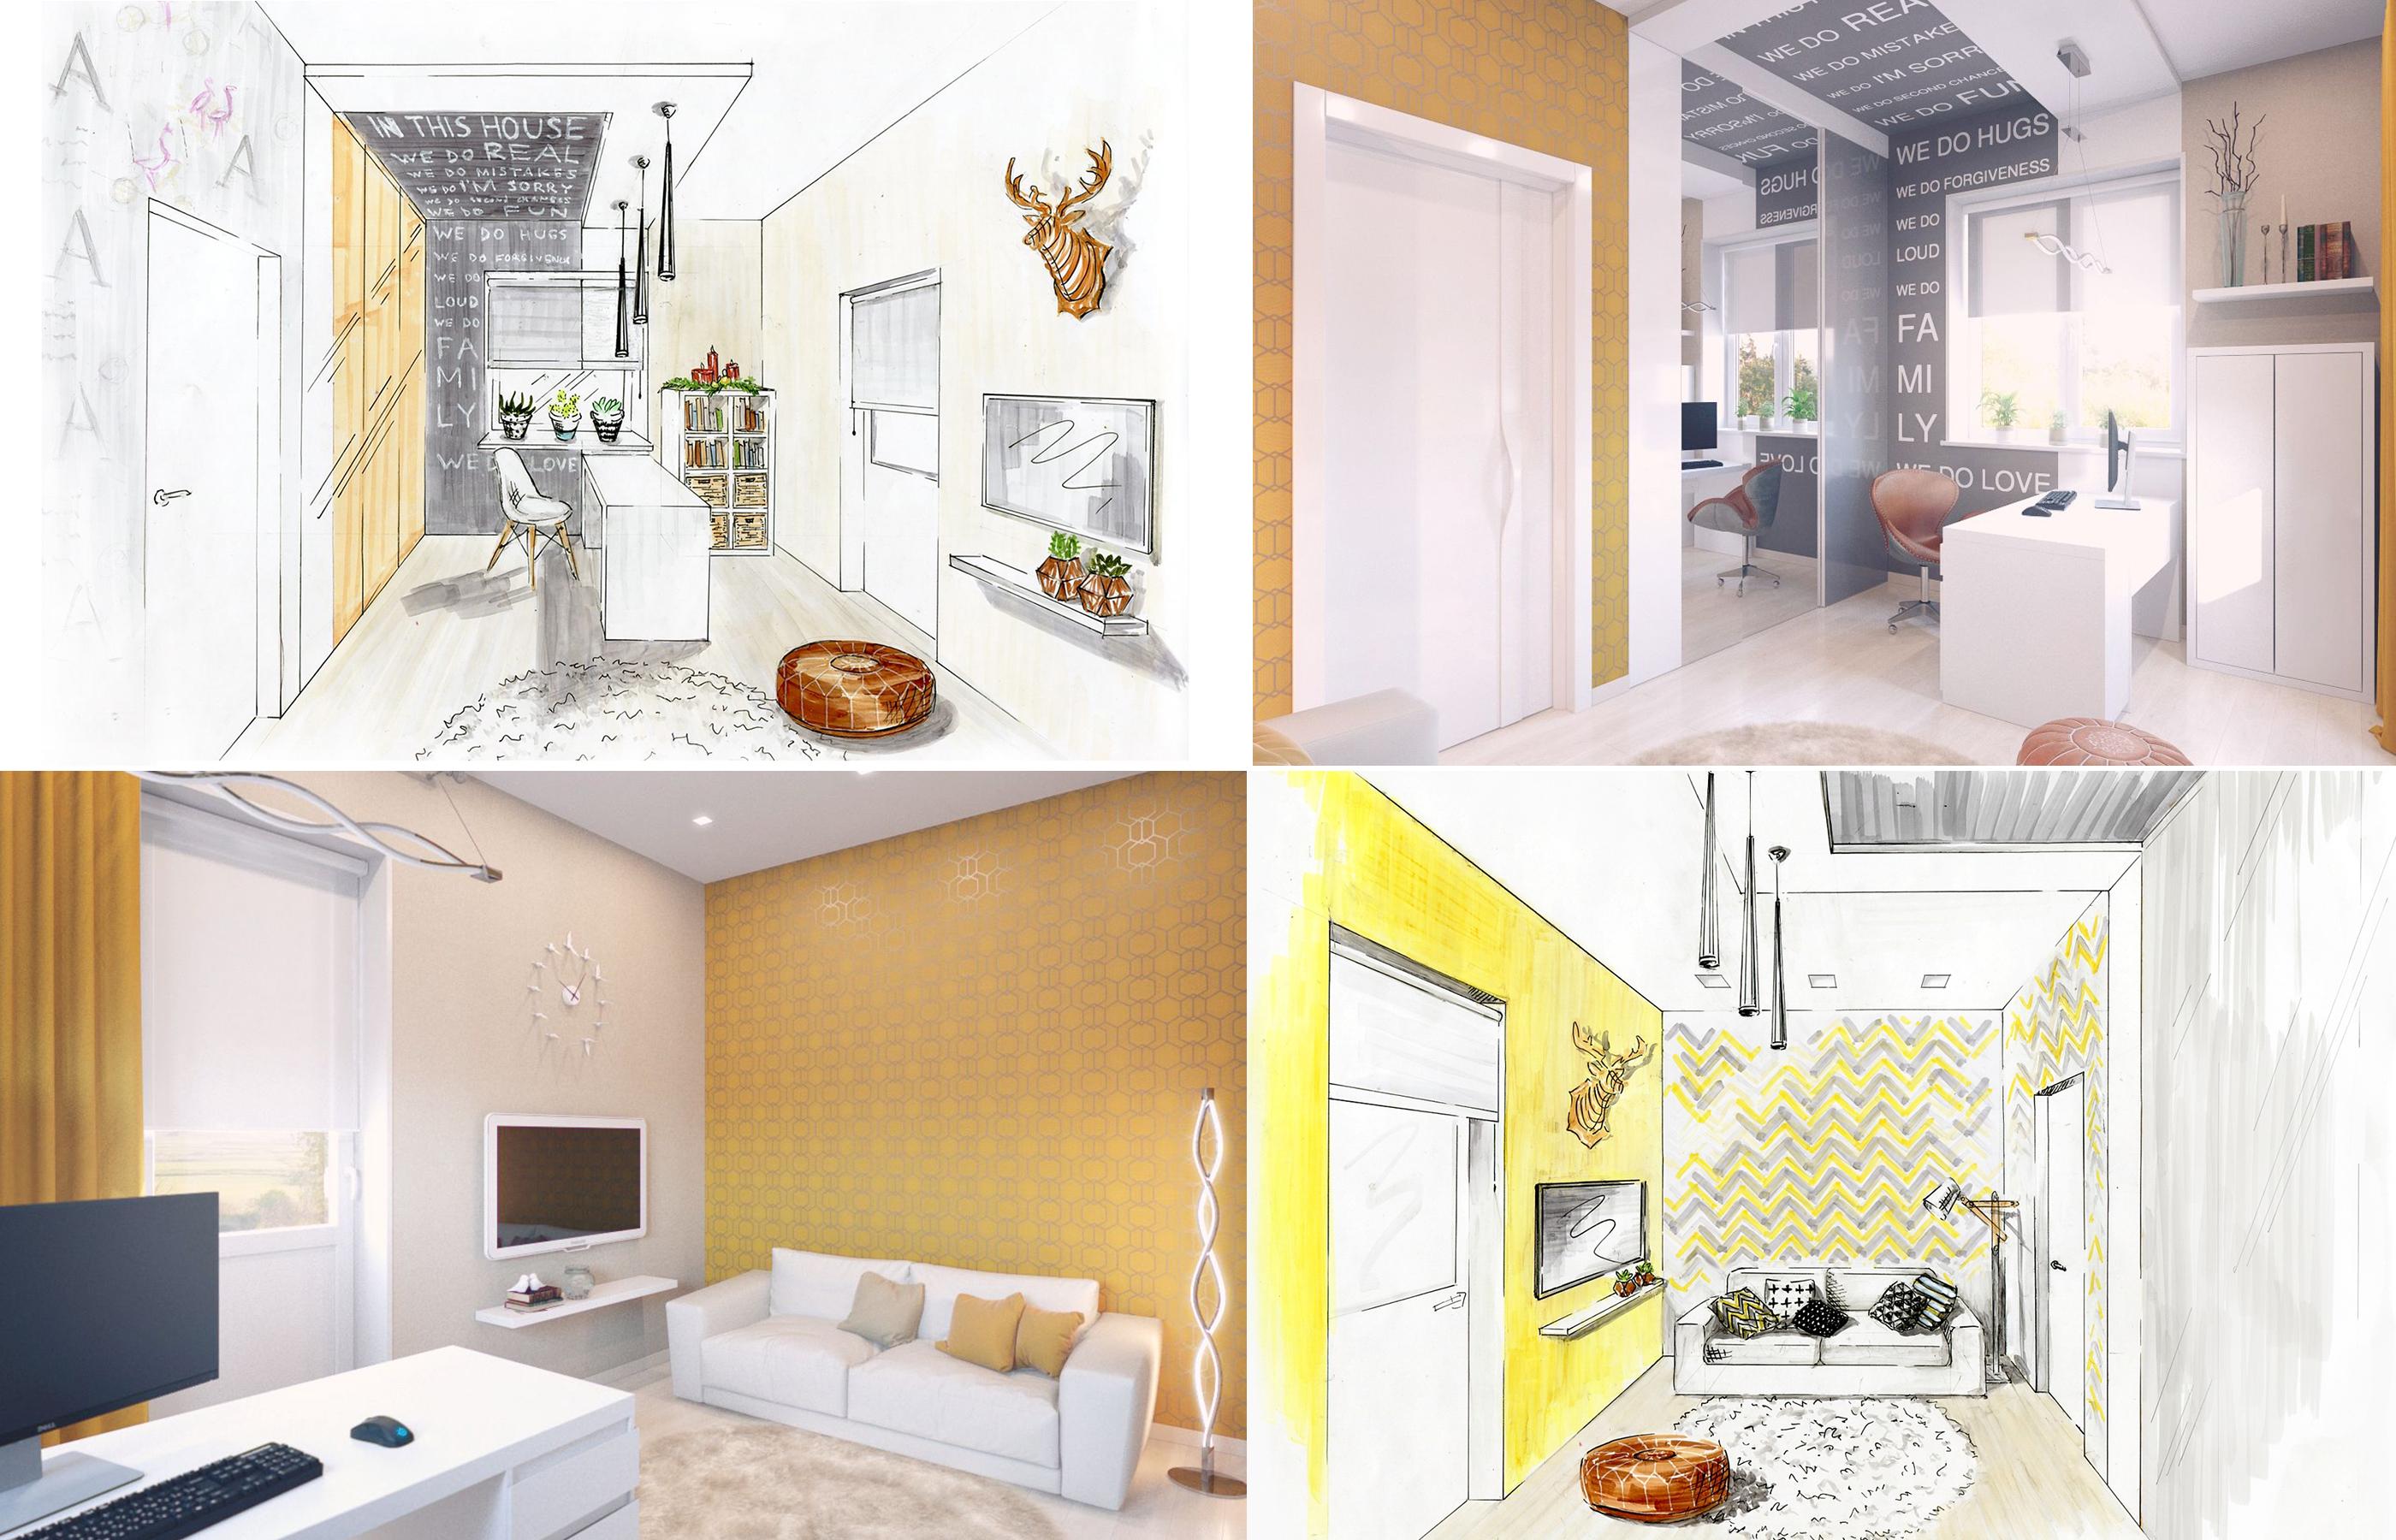 Проект дизайна интерьера кабинета